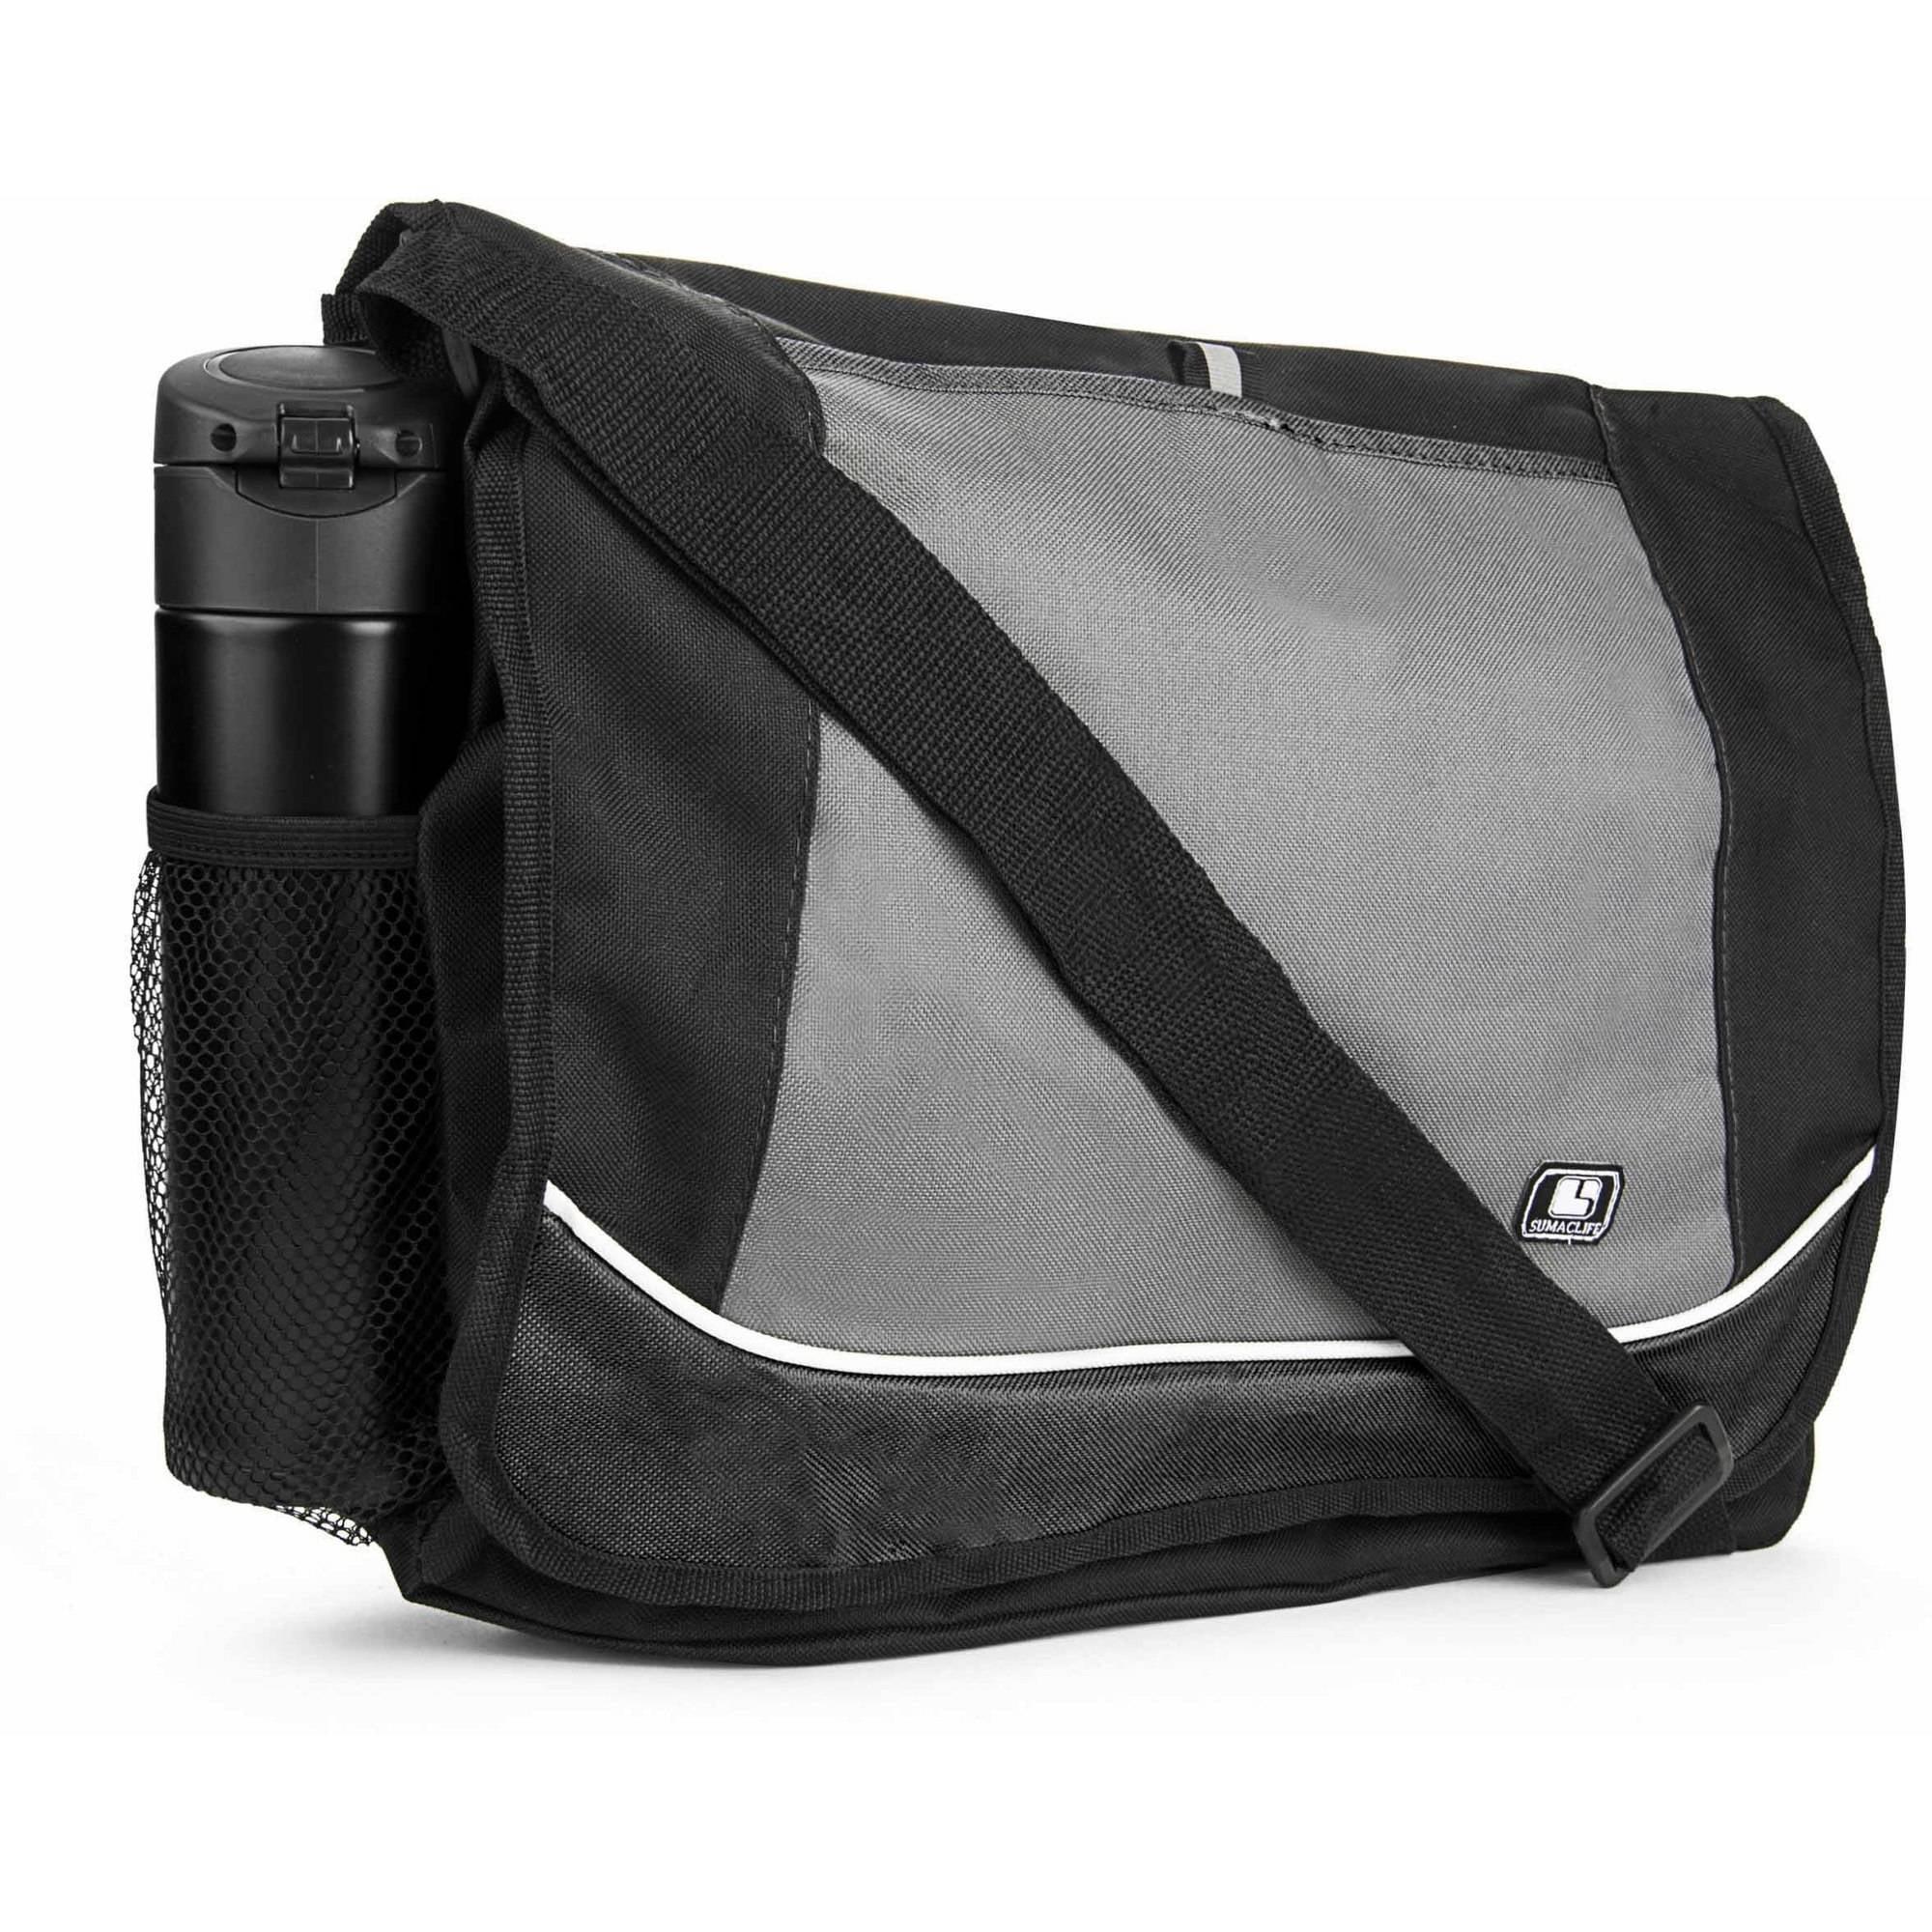 Universal Multi-Purpose Canvas Messenger Shoulder Bag for Laptops, Notebooks and Ultrabooks